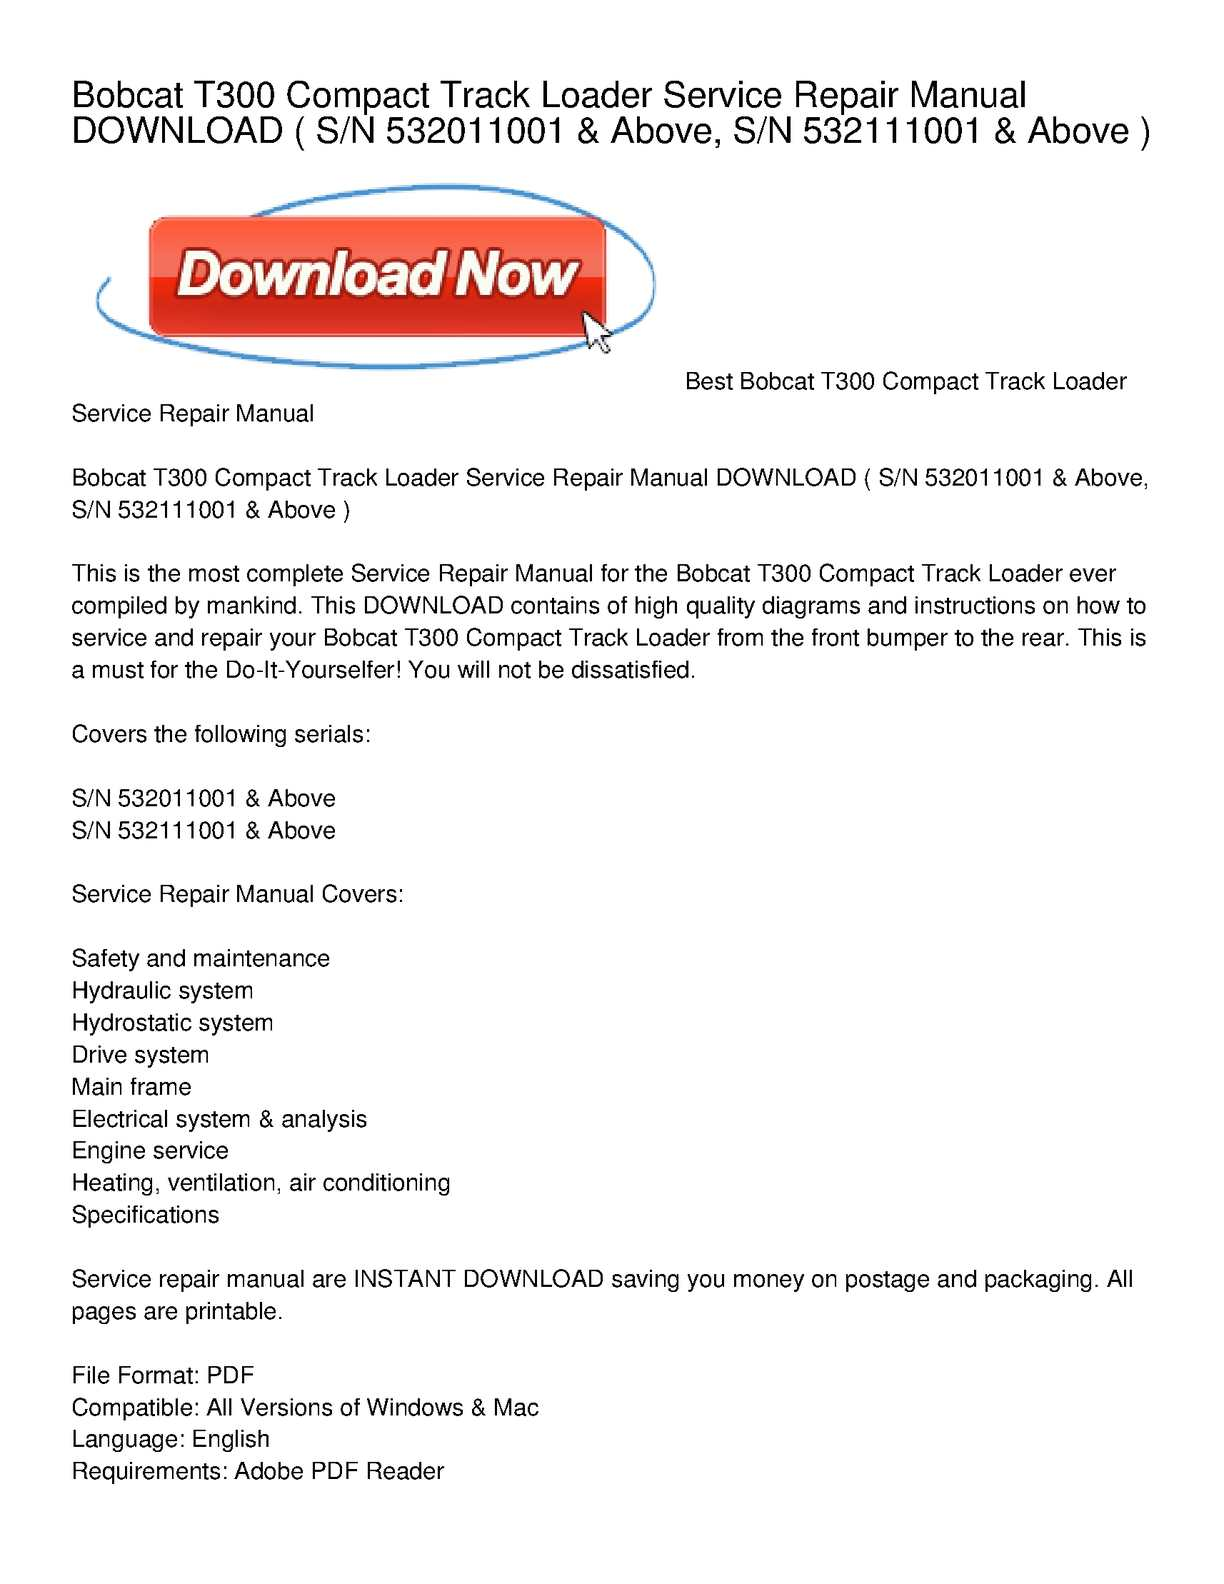 Calaméo - Bobcat T300 Compact Track Loader Service Repair Manual DOWNLOAD